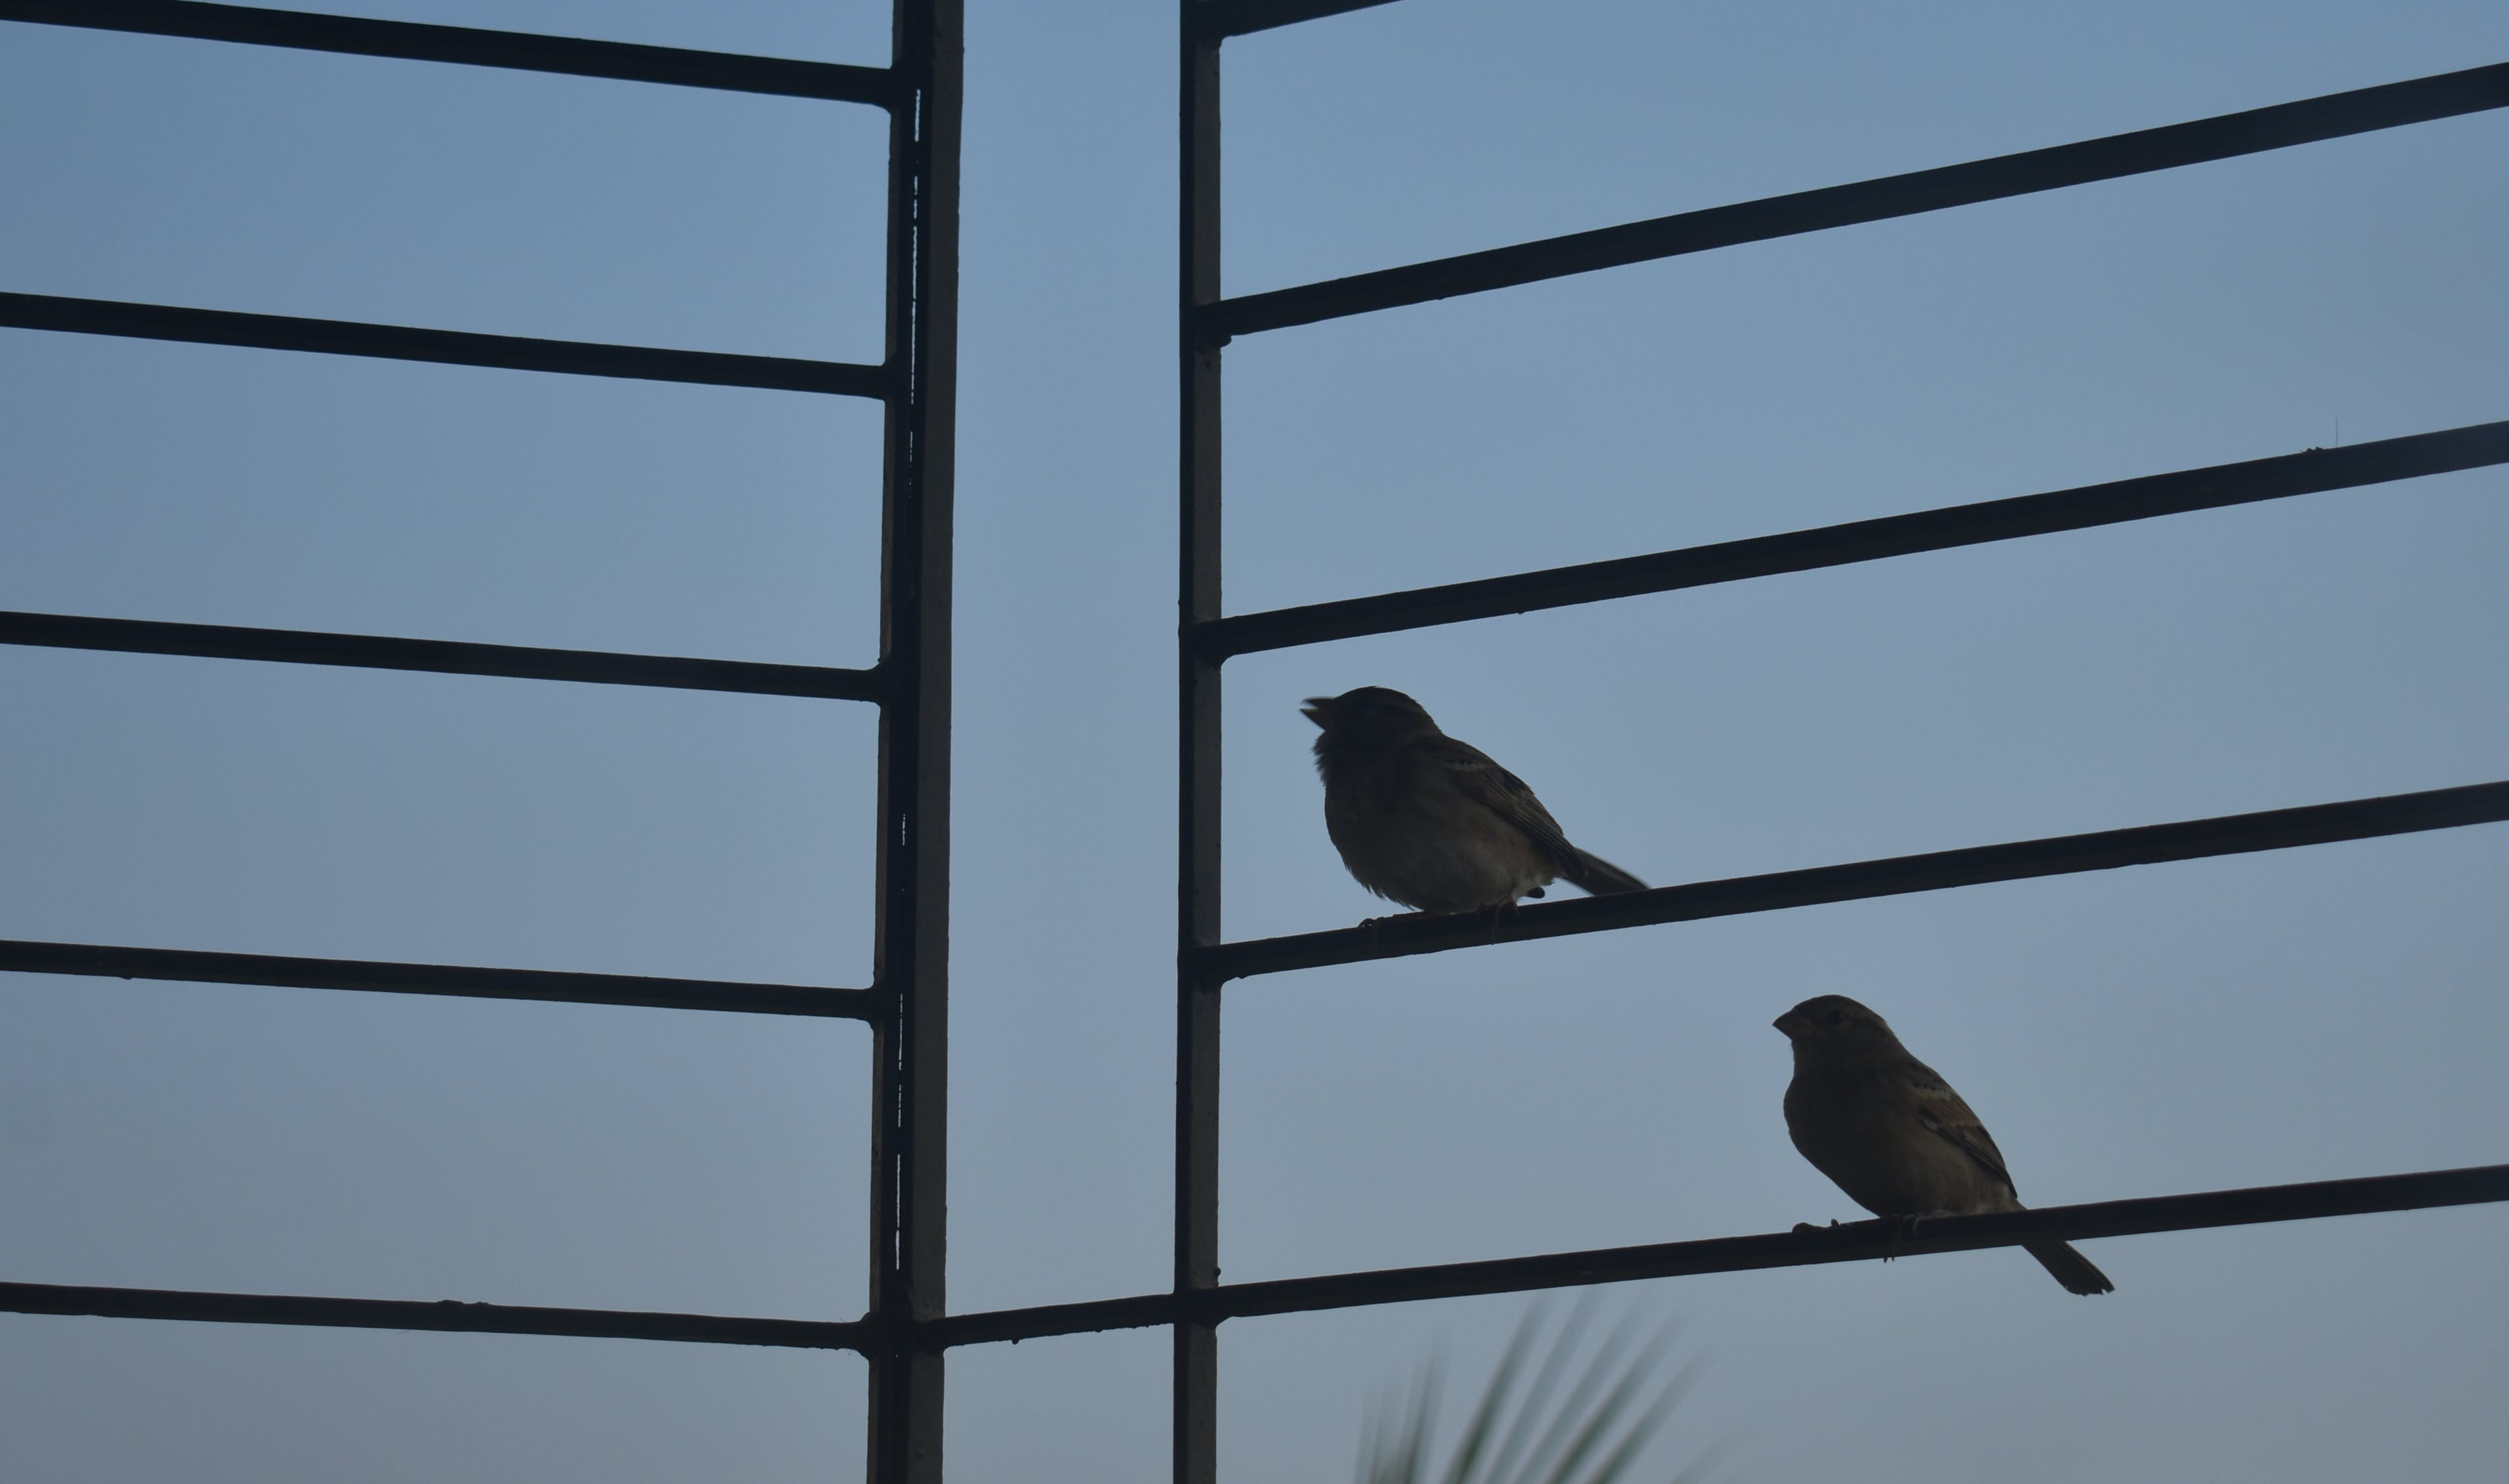 Free stock photo of sparrow